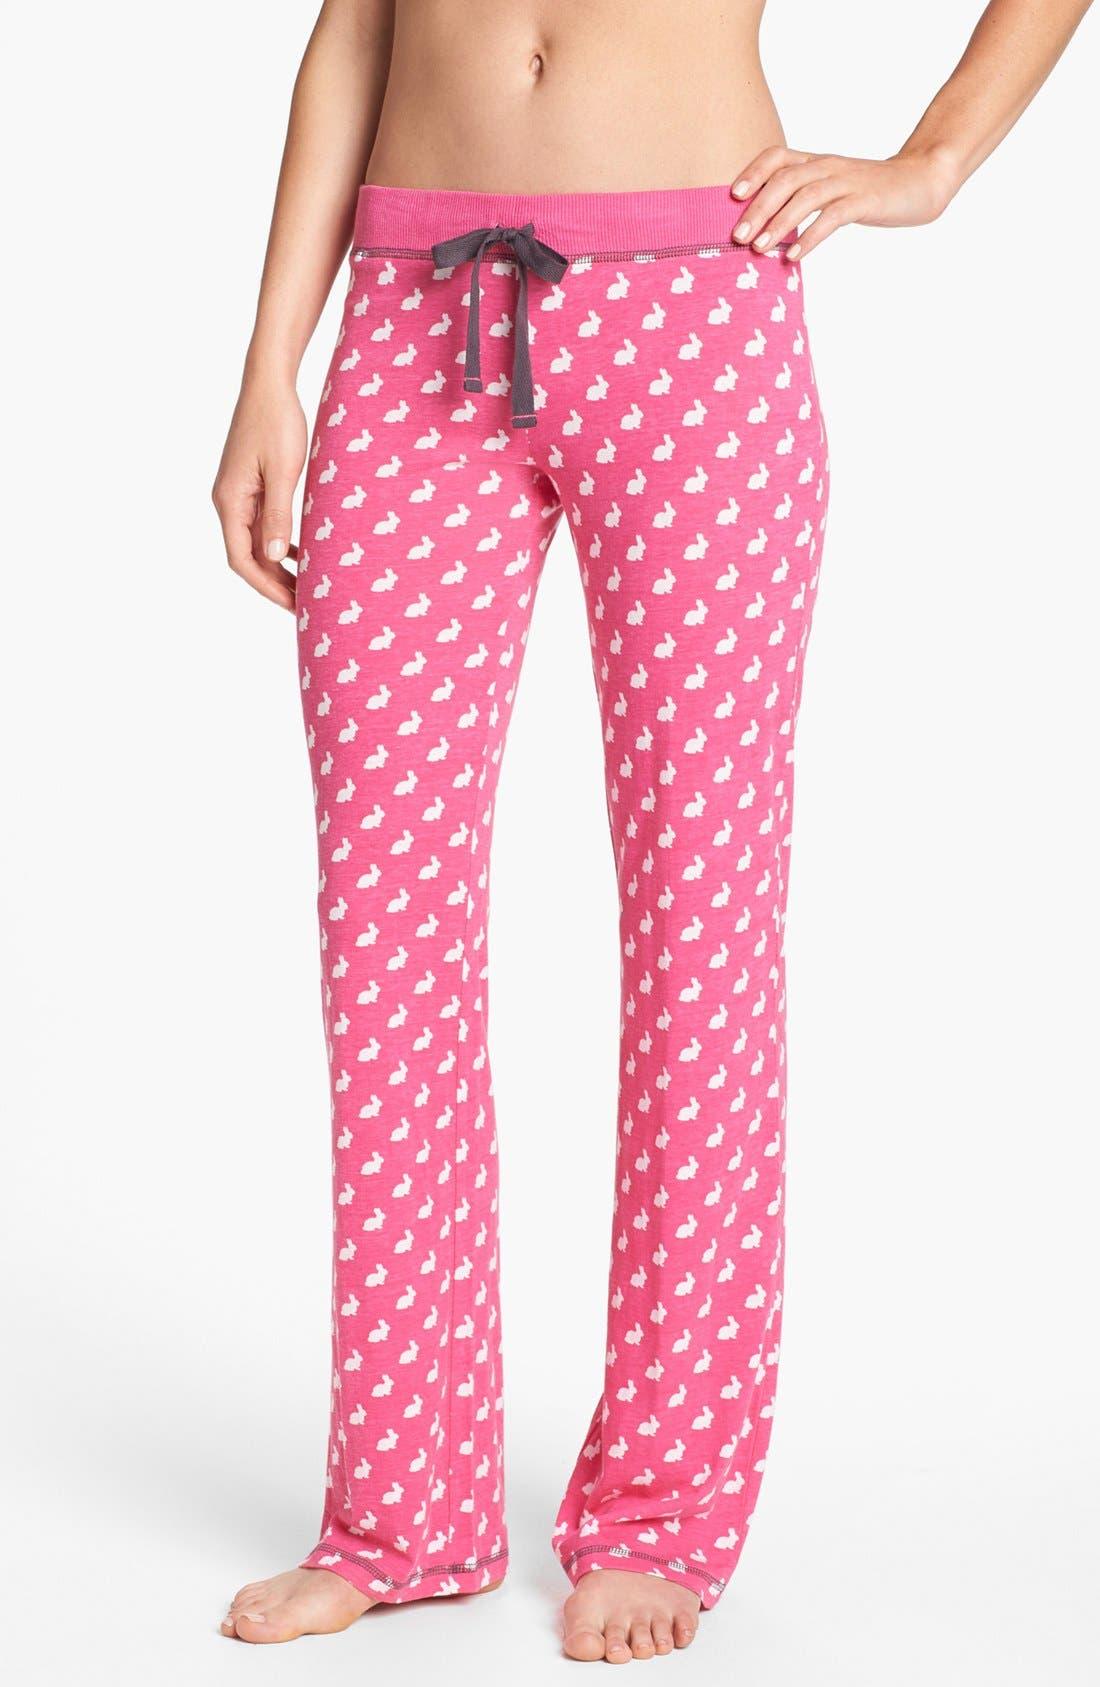 Alternate Image 1 Selected - COZY ZOE Knit Lounge Pants